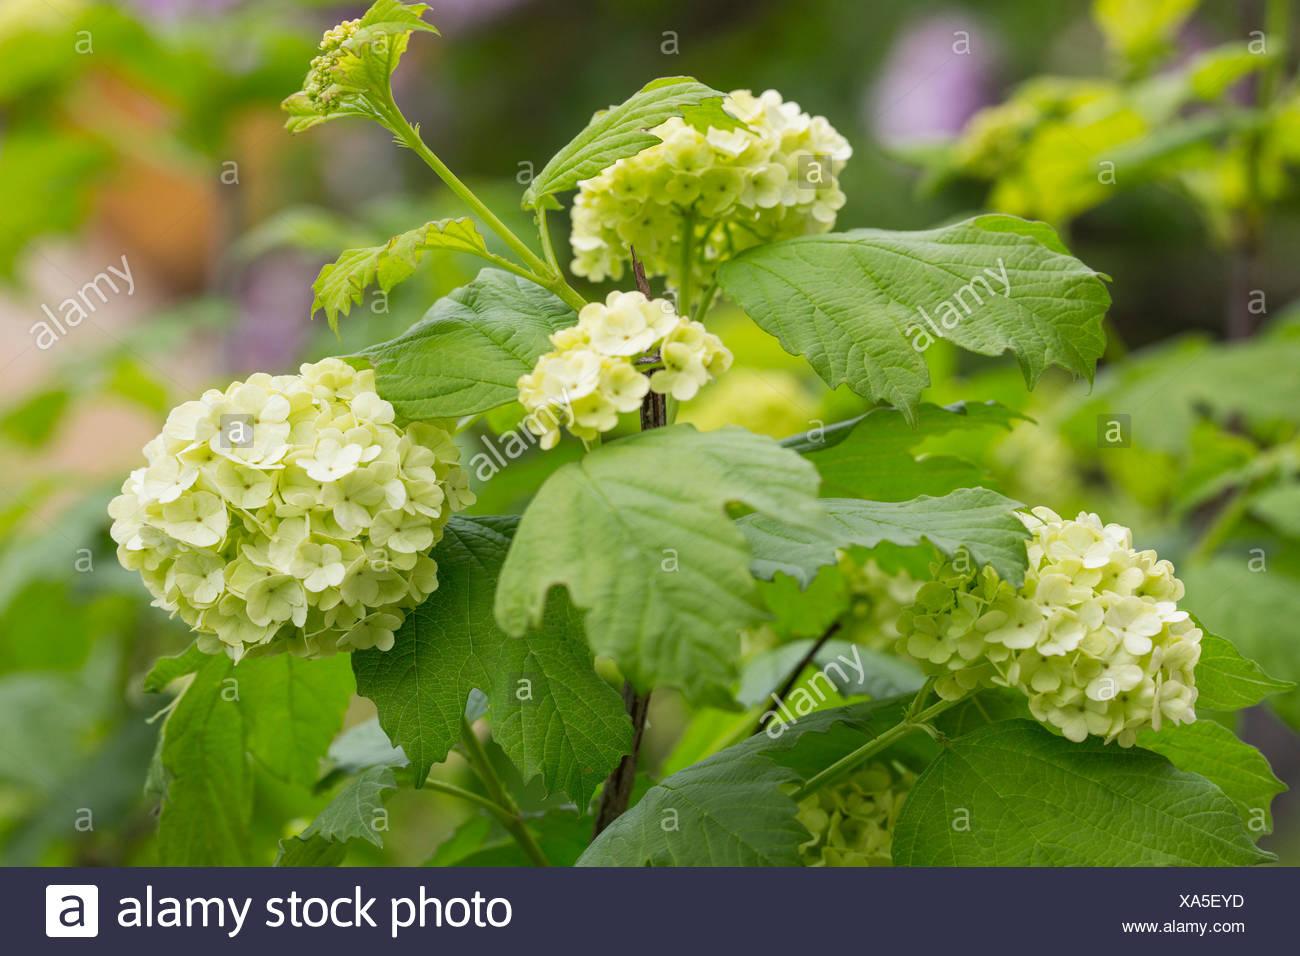 Hydrangea bush with white flowers stock photo 281633953 alamy hydrangea bush with white flowers mightylinksfo